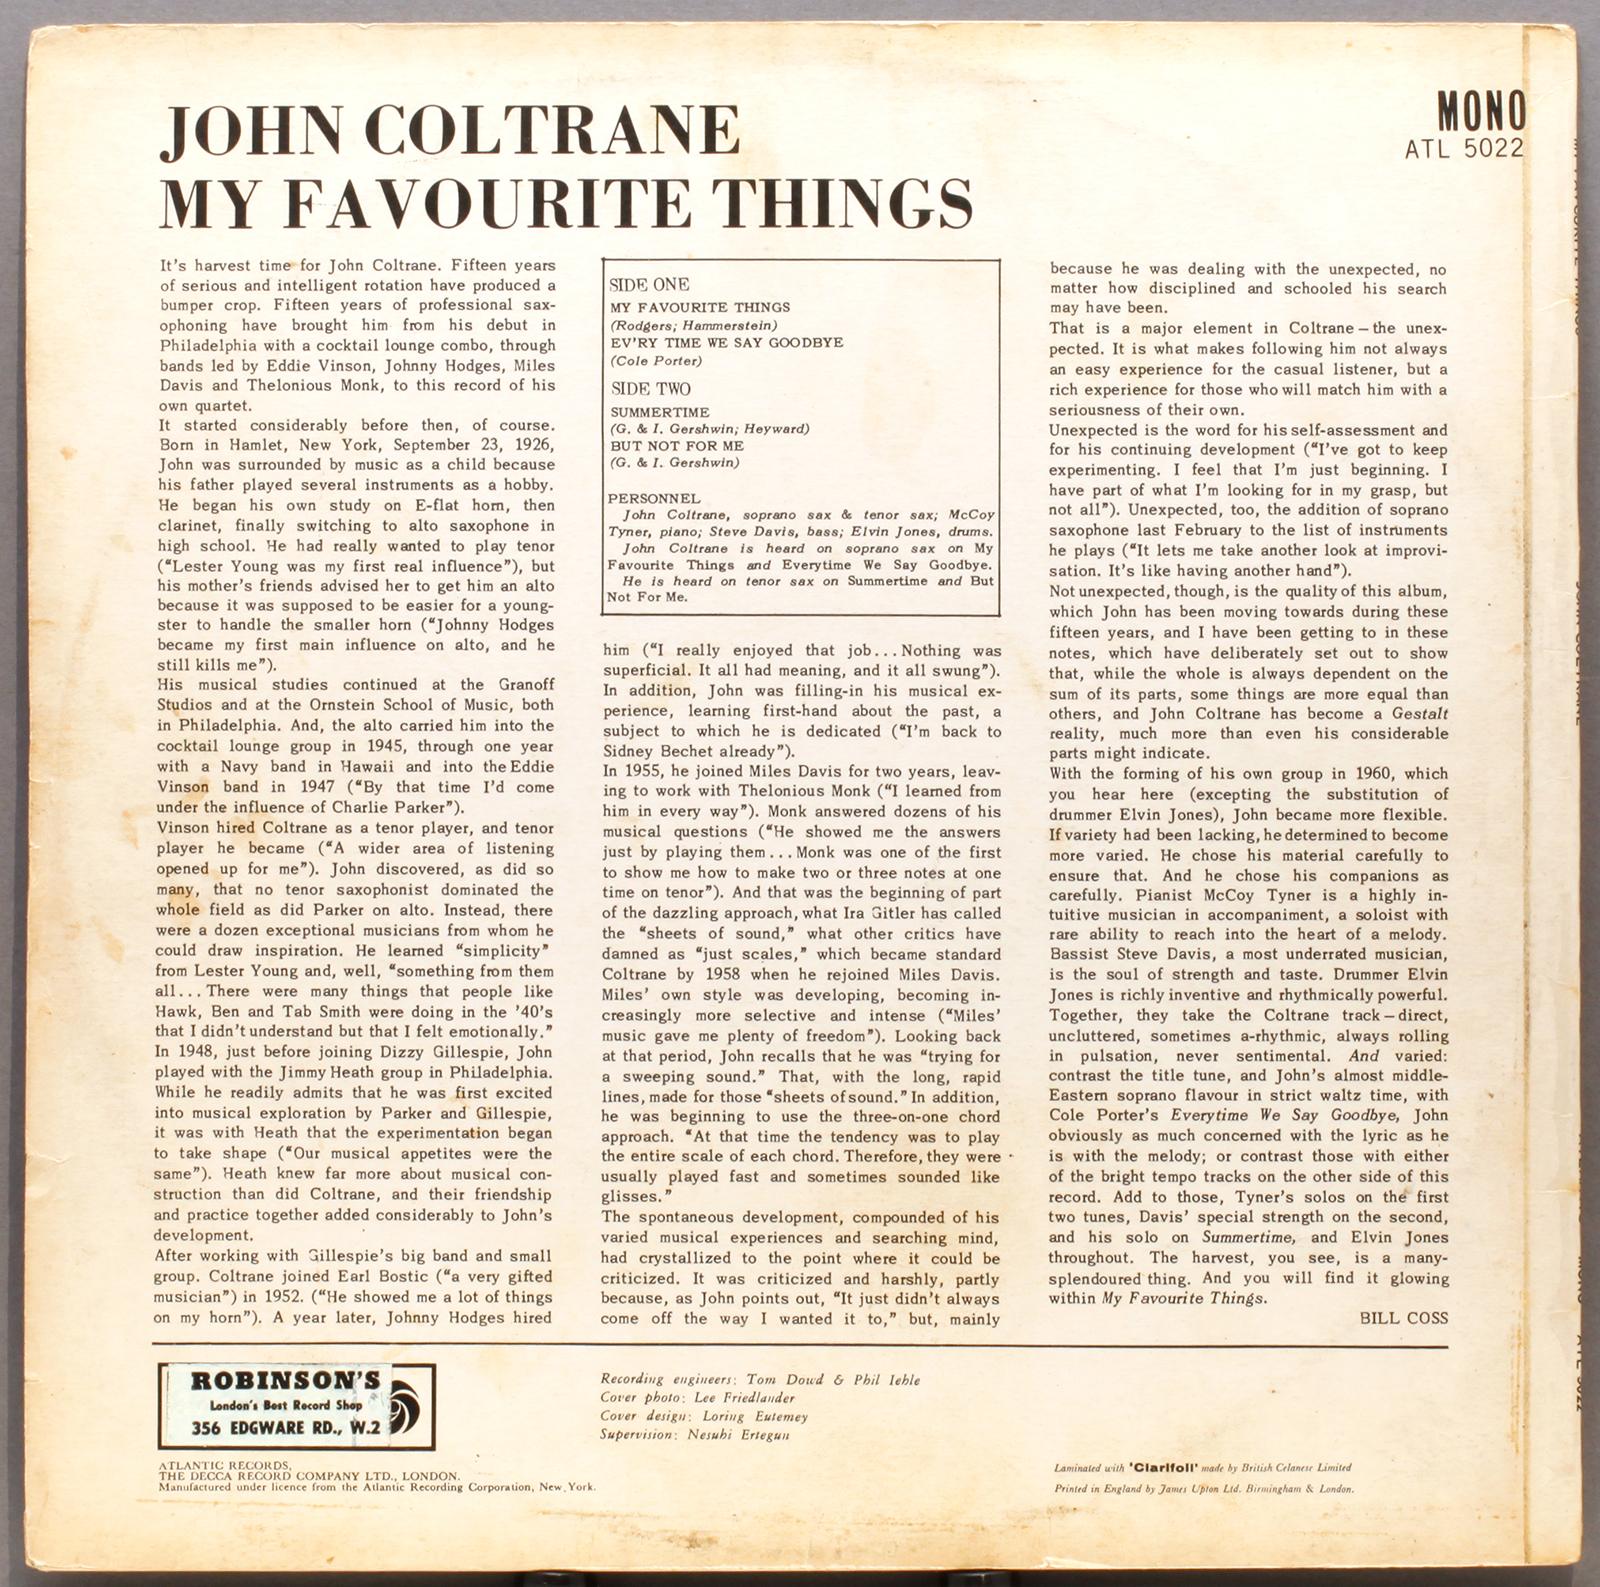 worksheet My Favorite Things Worksheet john coltrane my favourite things 1960 atlantic uk atl5022 back 1600